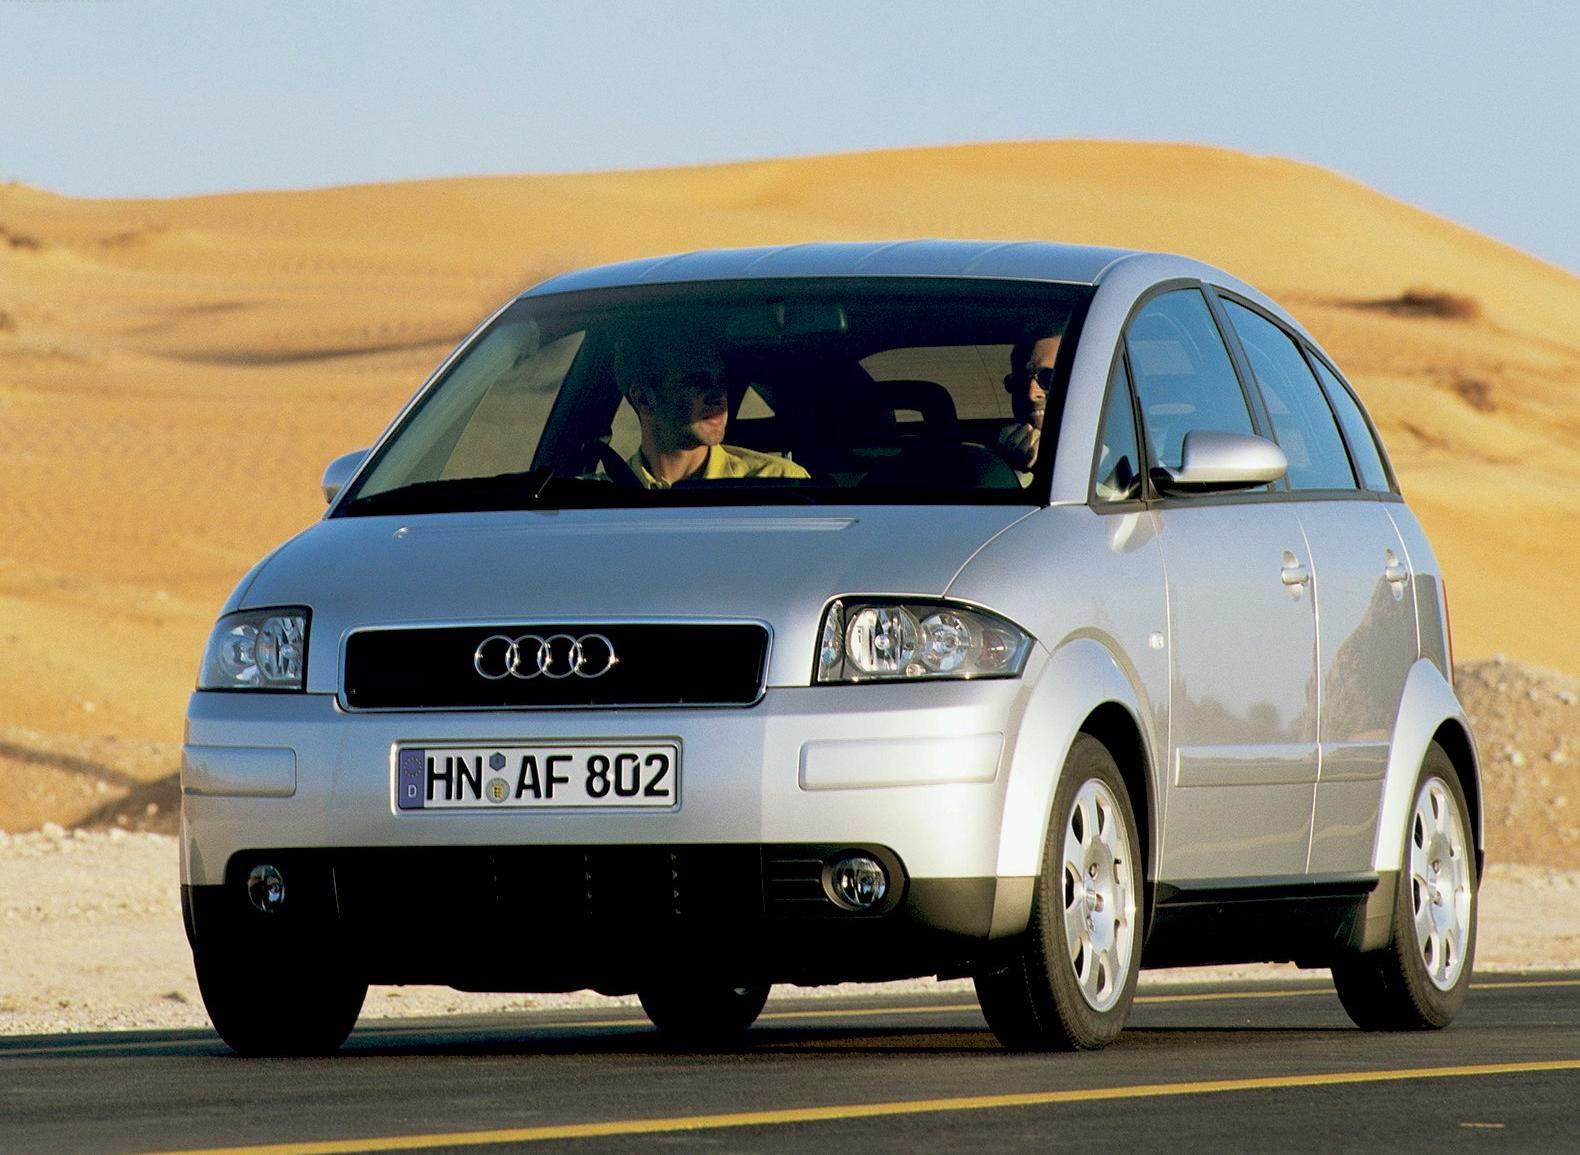 Audi A2 2001 Widescreen Wallpaper